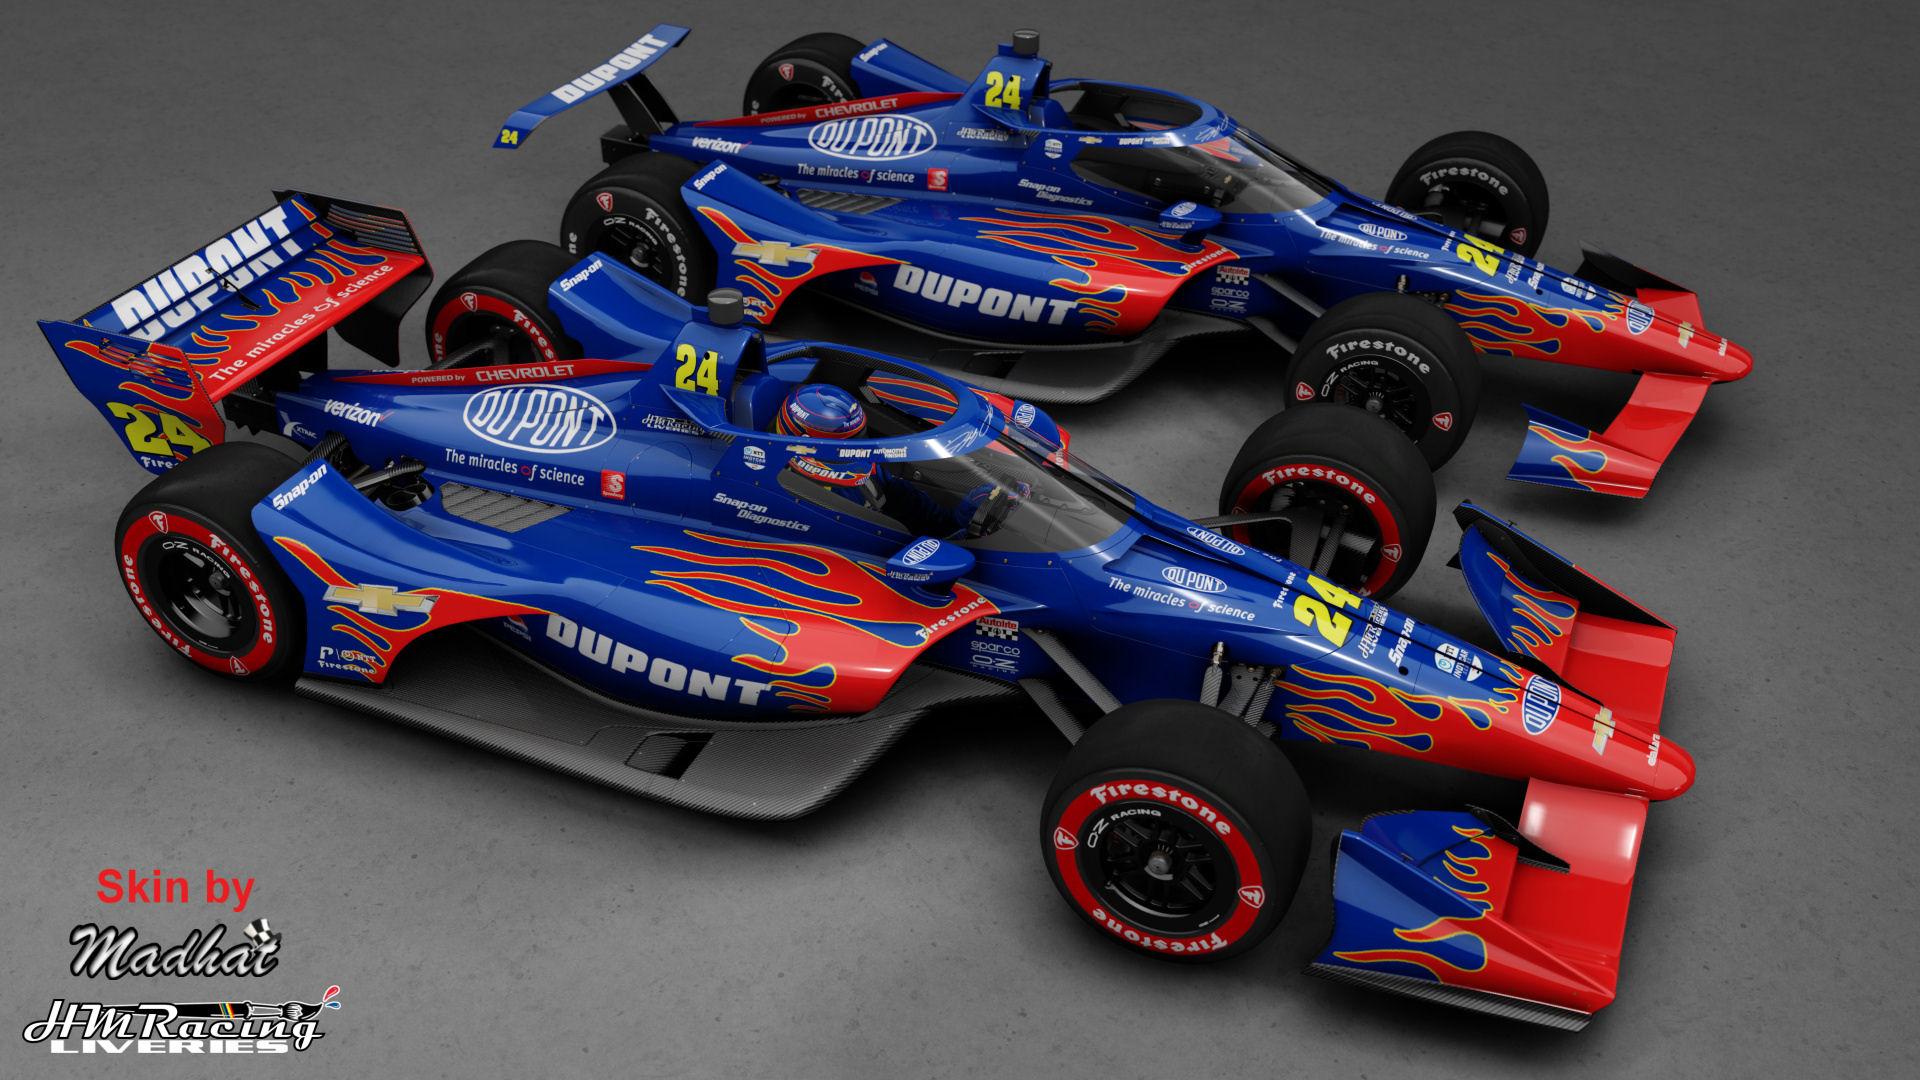 DU PONT Jeff Gordon 24 IndyCar Madhat HMRacing Liveries 01.jpg